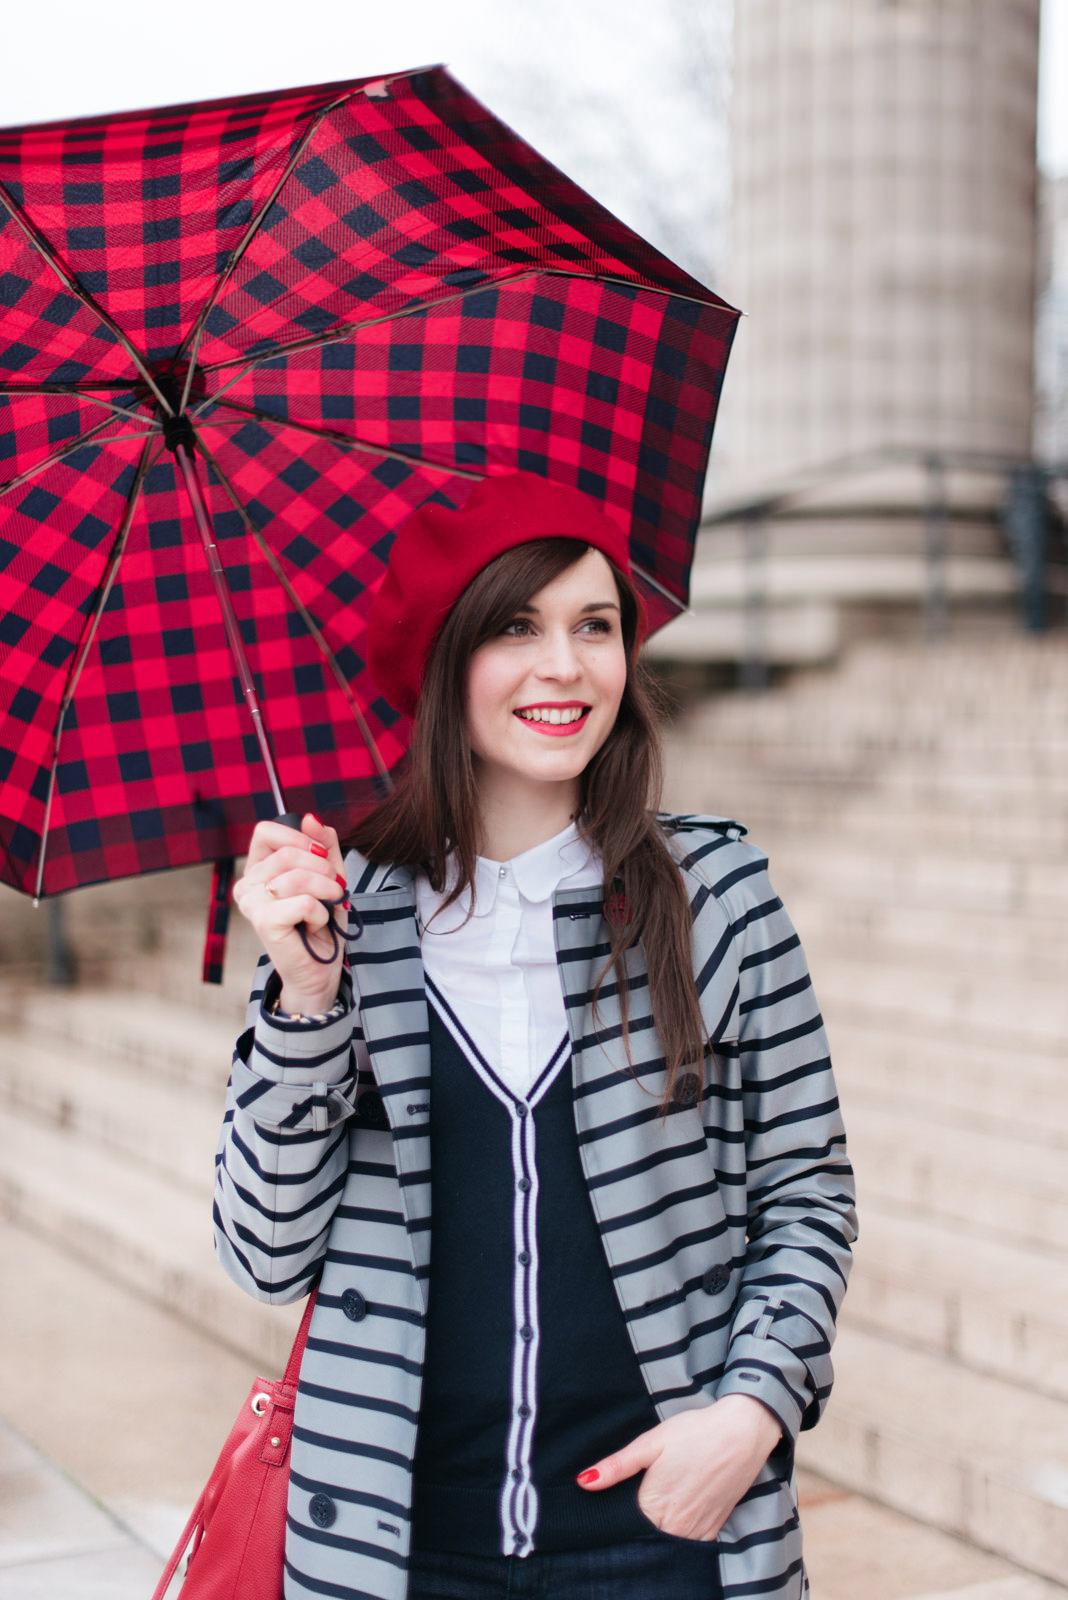 Blog-Mode-And-The-City-Looks-Comment-S-Habiller-quand-il-pleut-7